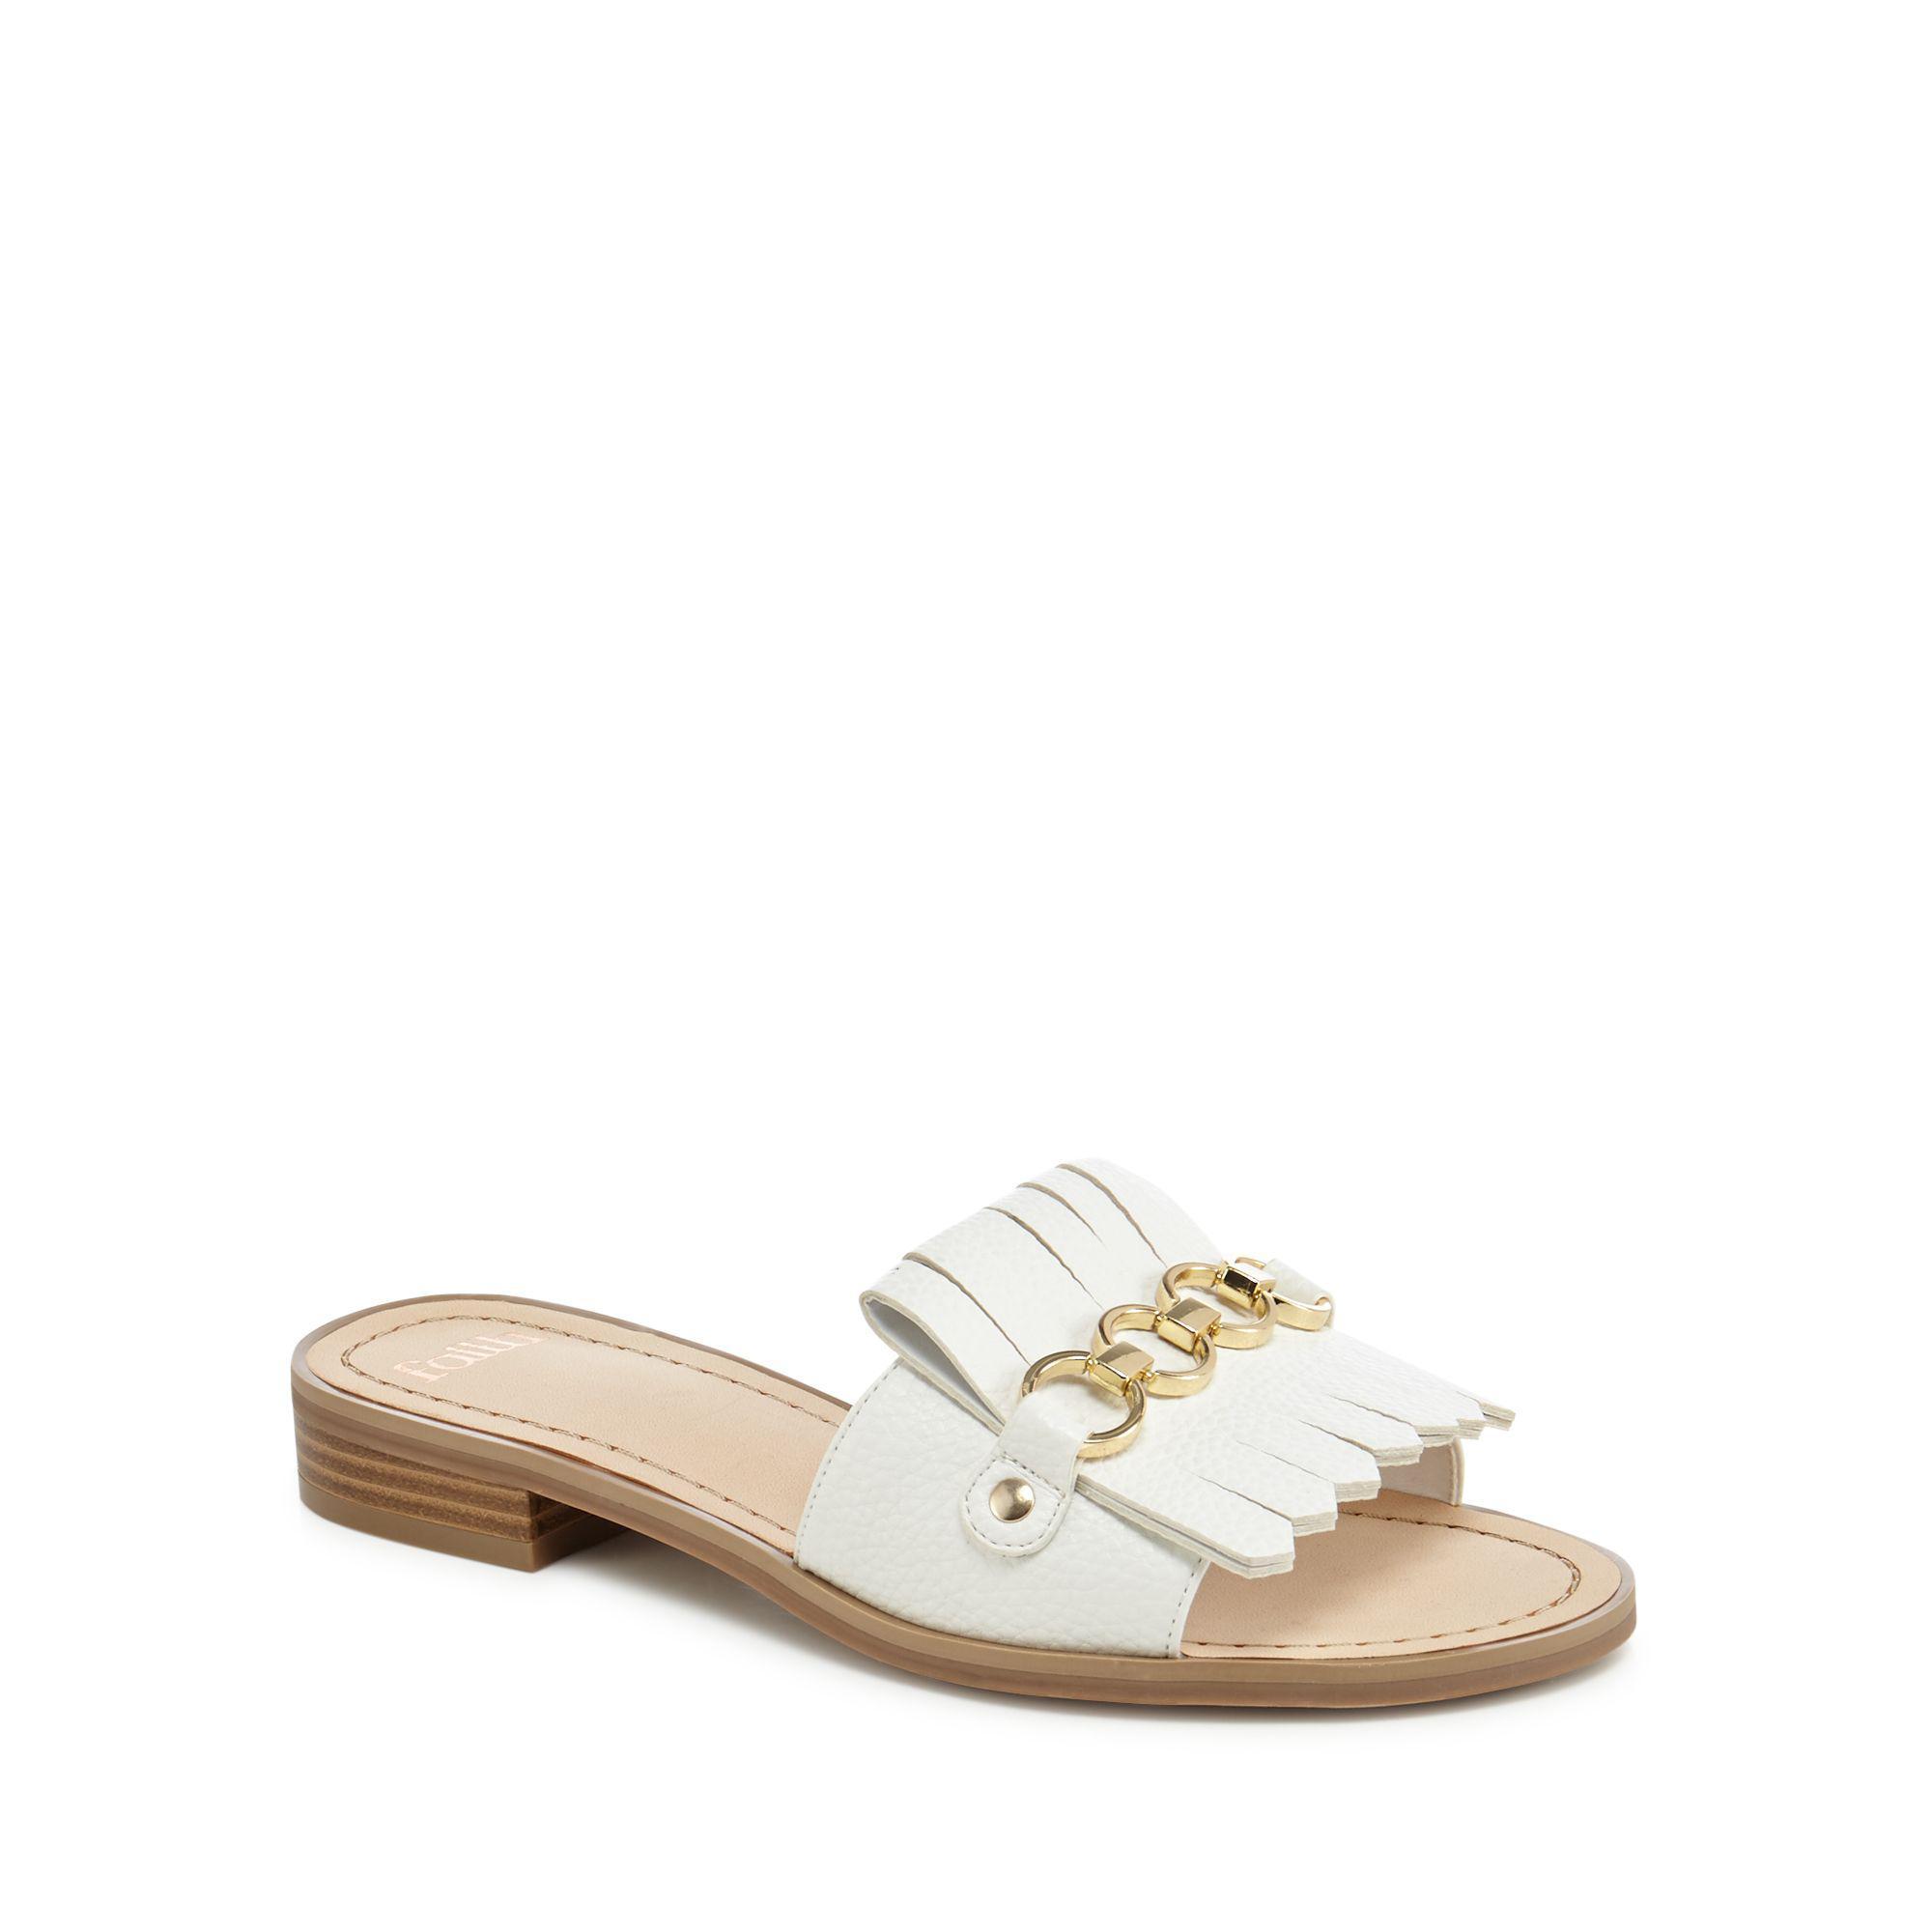 cheap sale online wide range of for sale White 'Jingle' slip-on sandals cheap footlocker buy cheap best seller 40uAzMg5